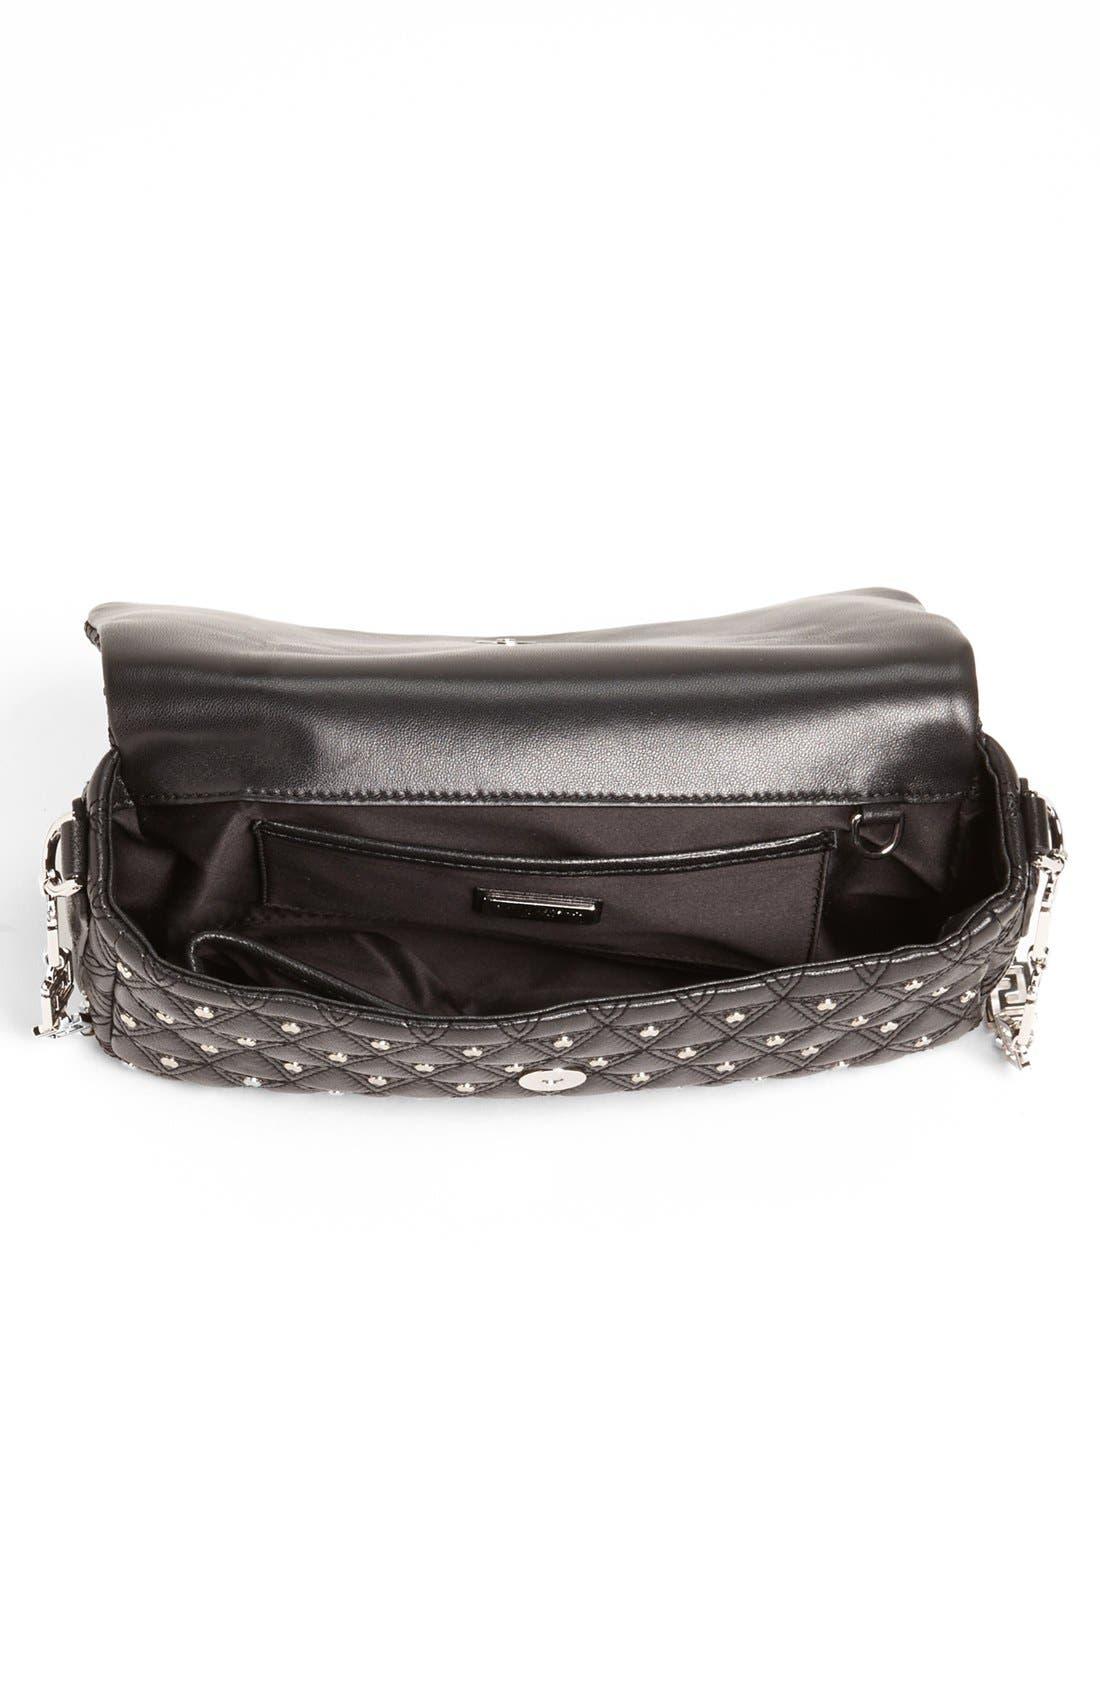 Alternate Image 3  - Versace 'Vanitas' Leather Flap Shoulder Bag